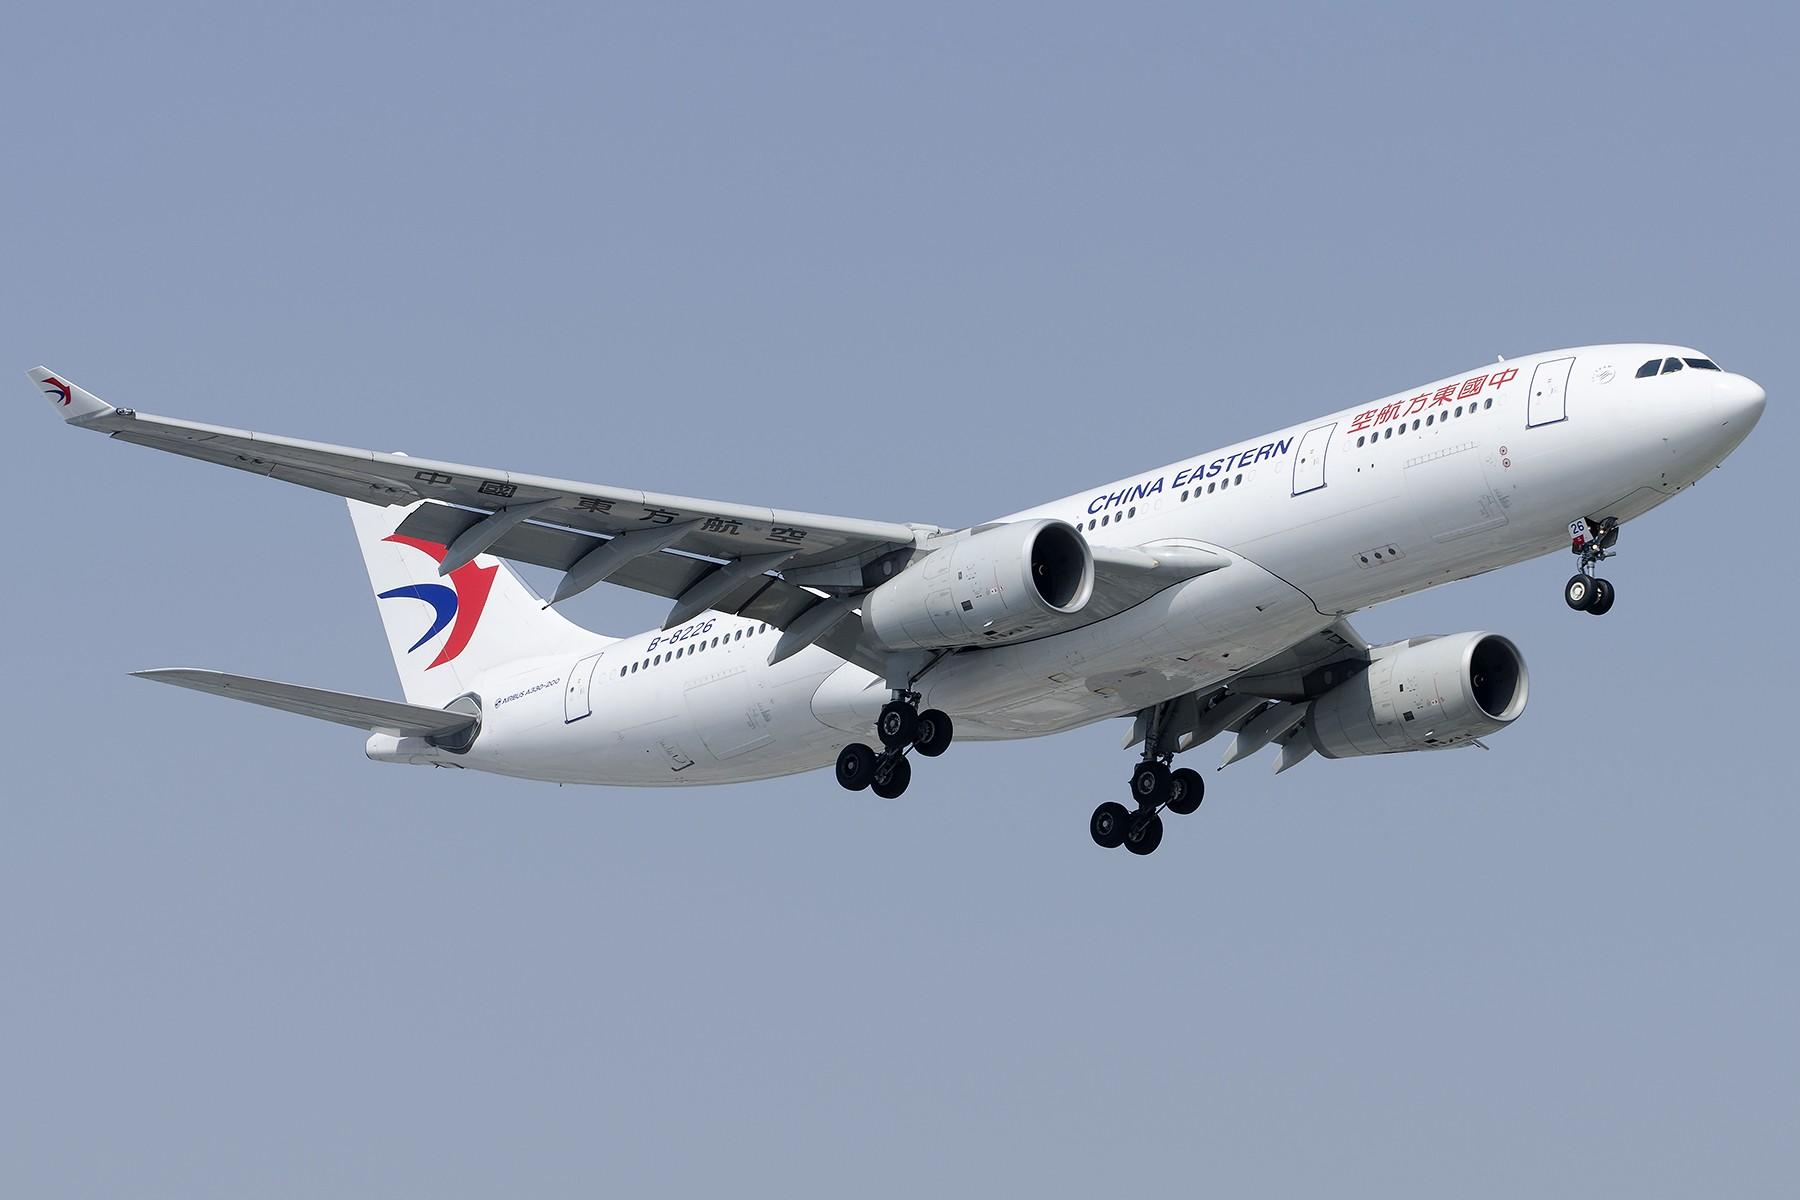 Re:[原创][原创]【SHA拍机*1800大图】4月拍的了,记得那天好货还挺多 AIRBUS A330-200 B-8226 中国上海虹桥国际机场